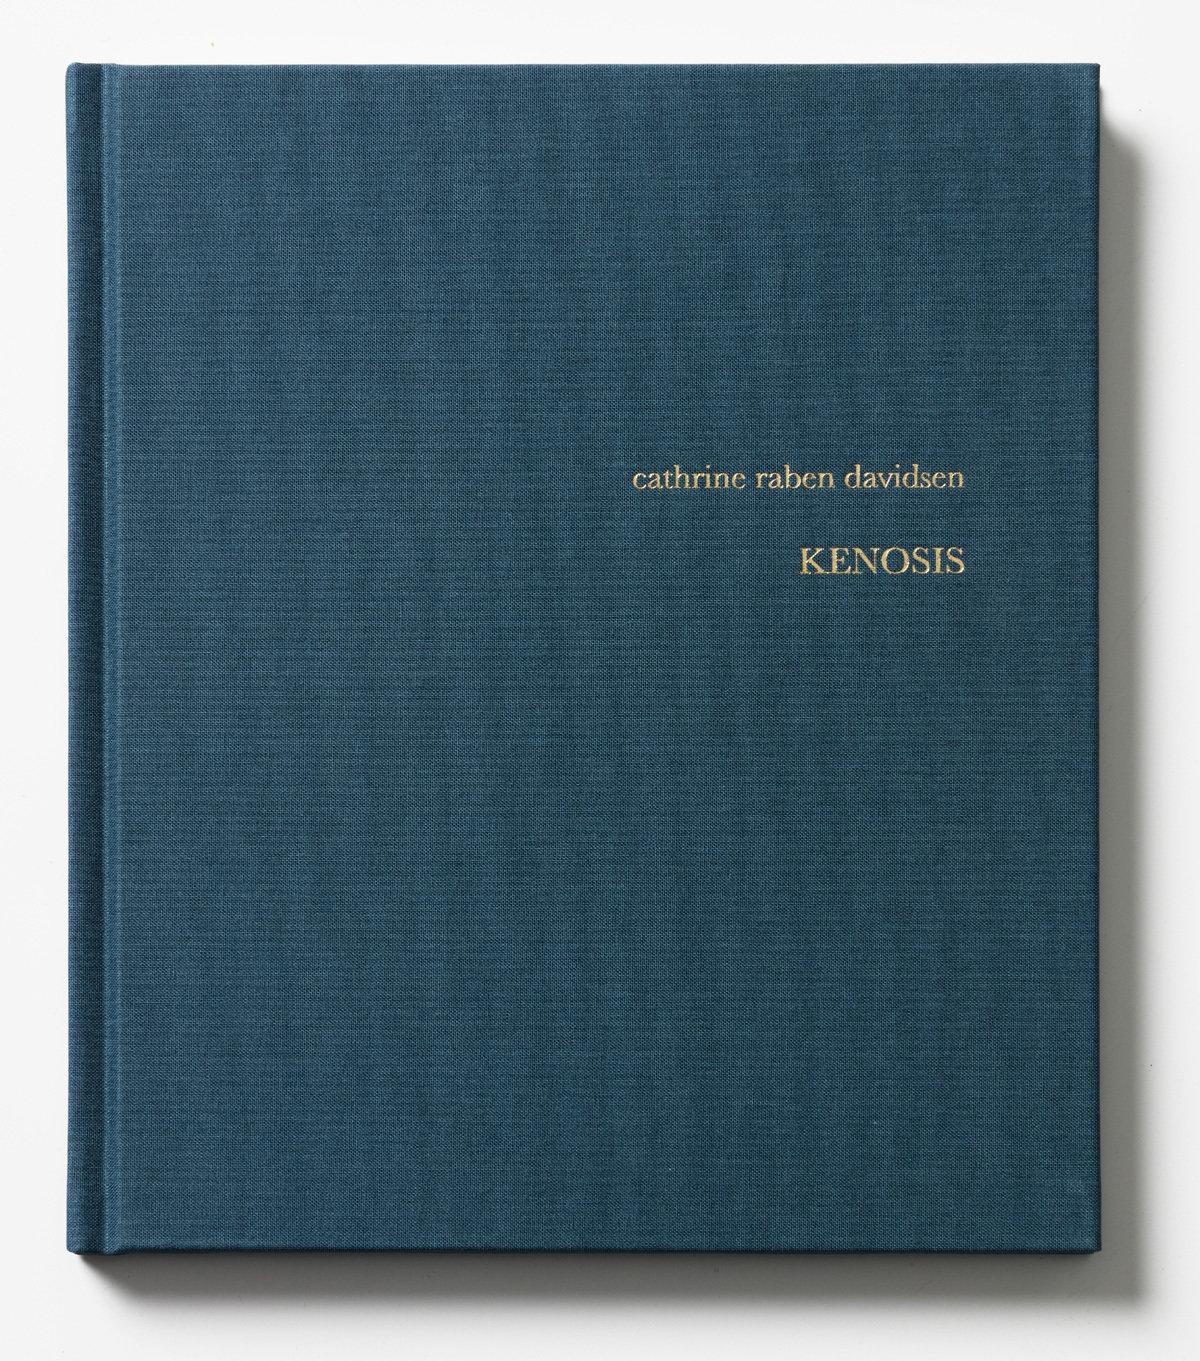 Kenosis - Book 00003